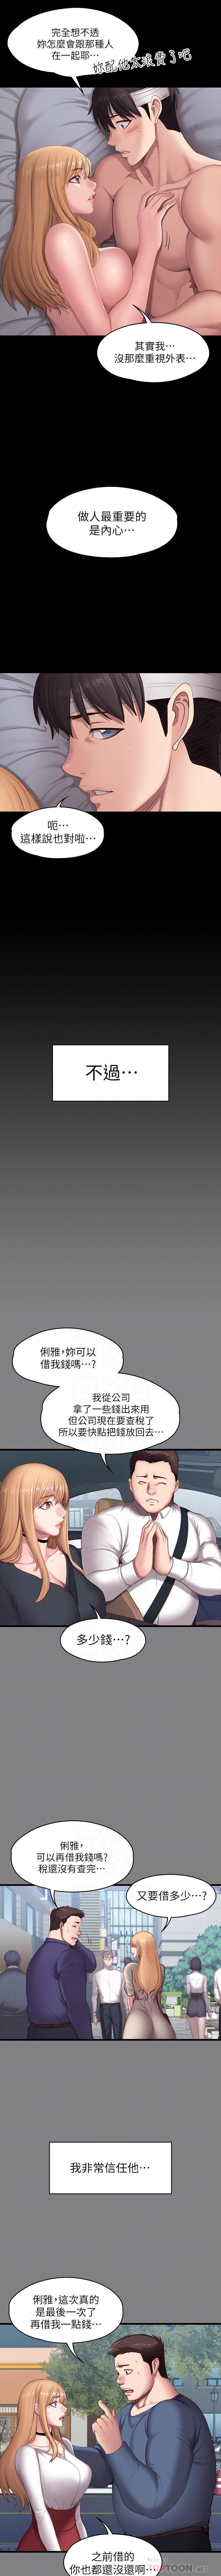 FITNESS 61-88 CHI 7